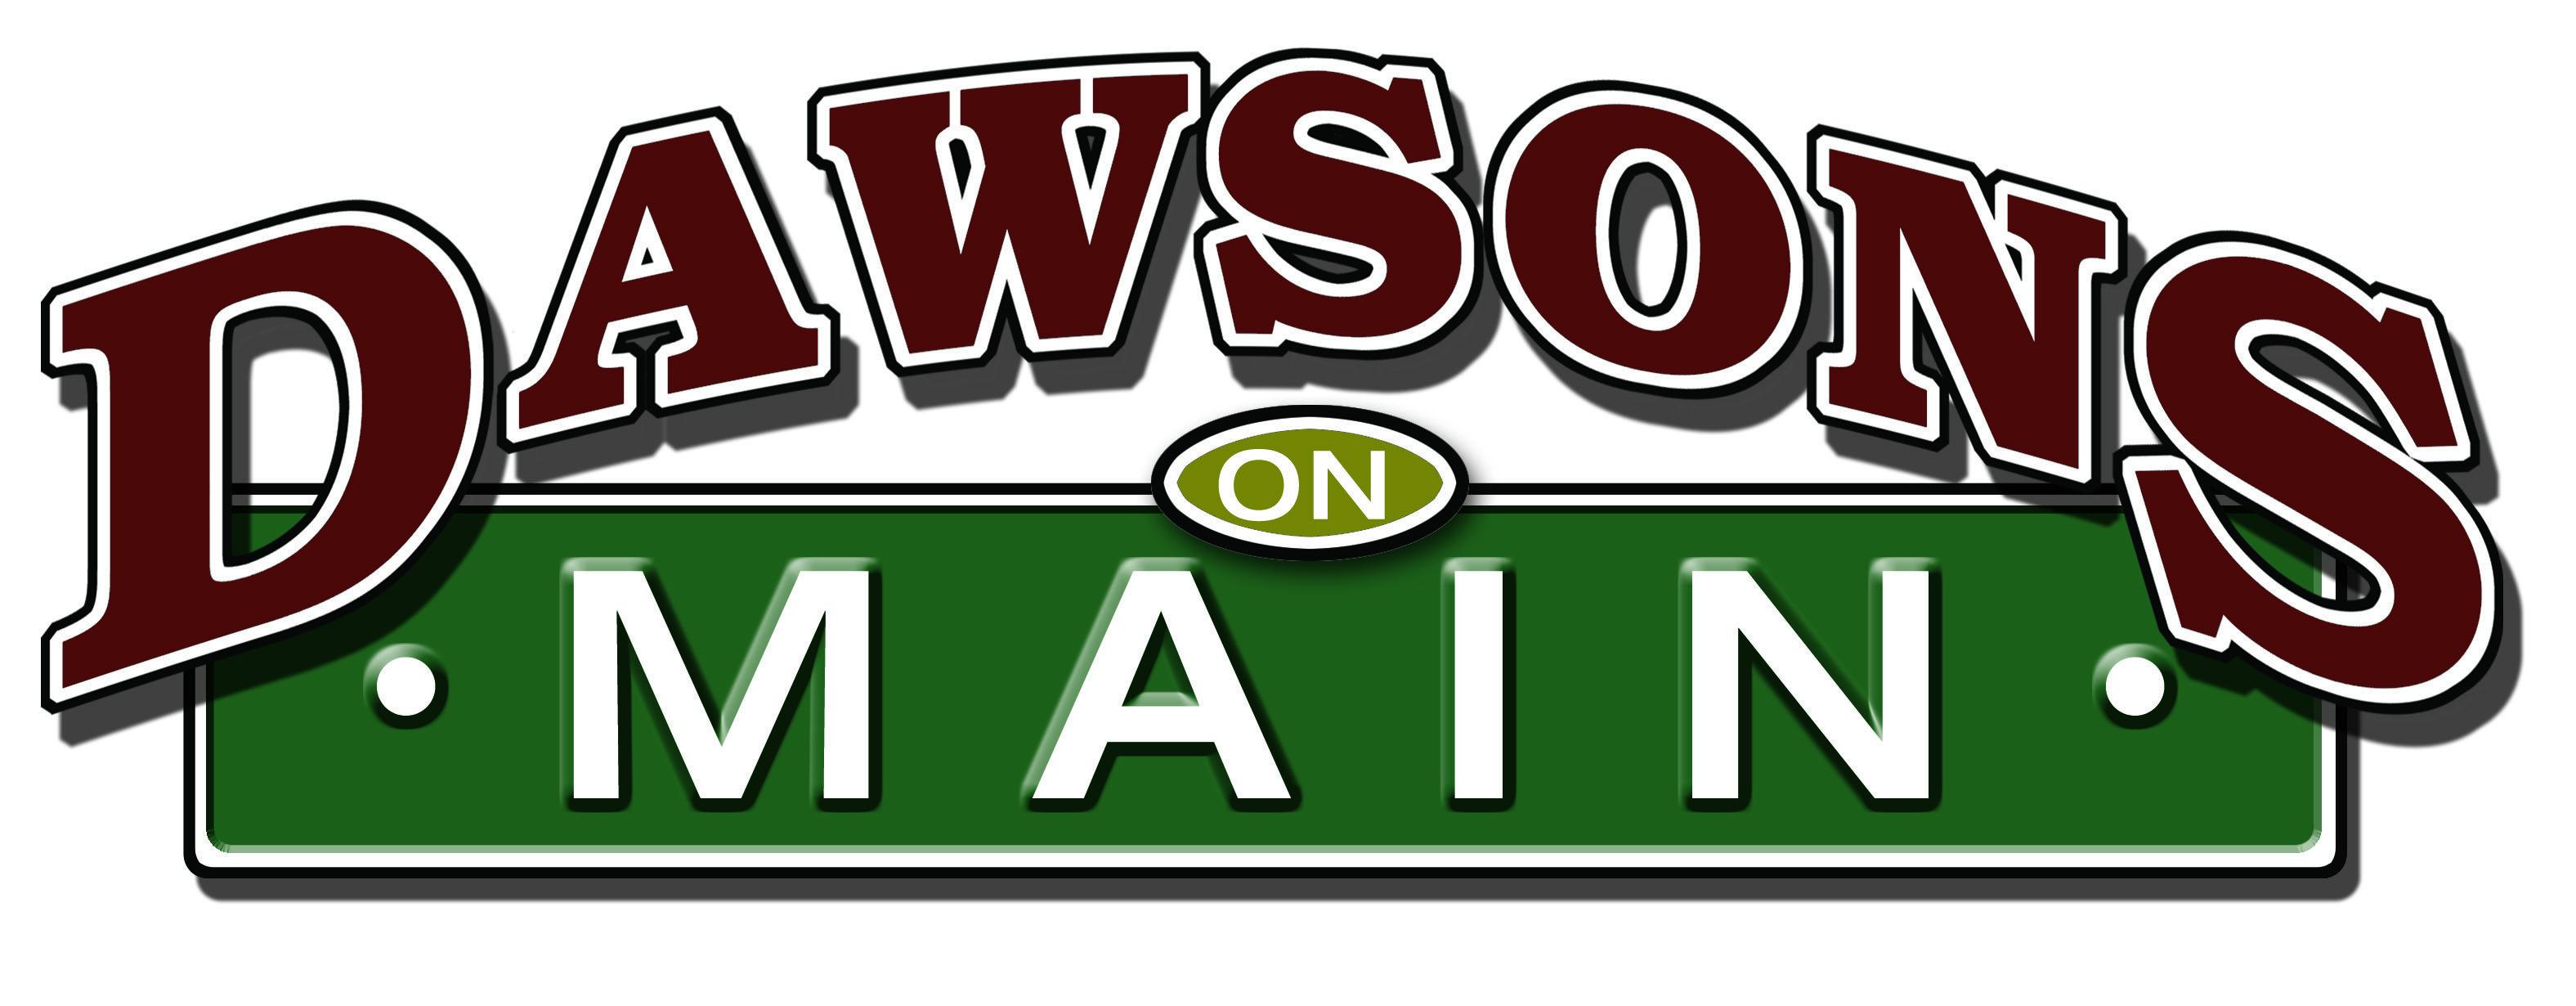 Dawson's on Main